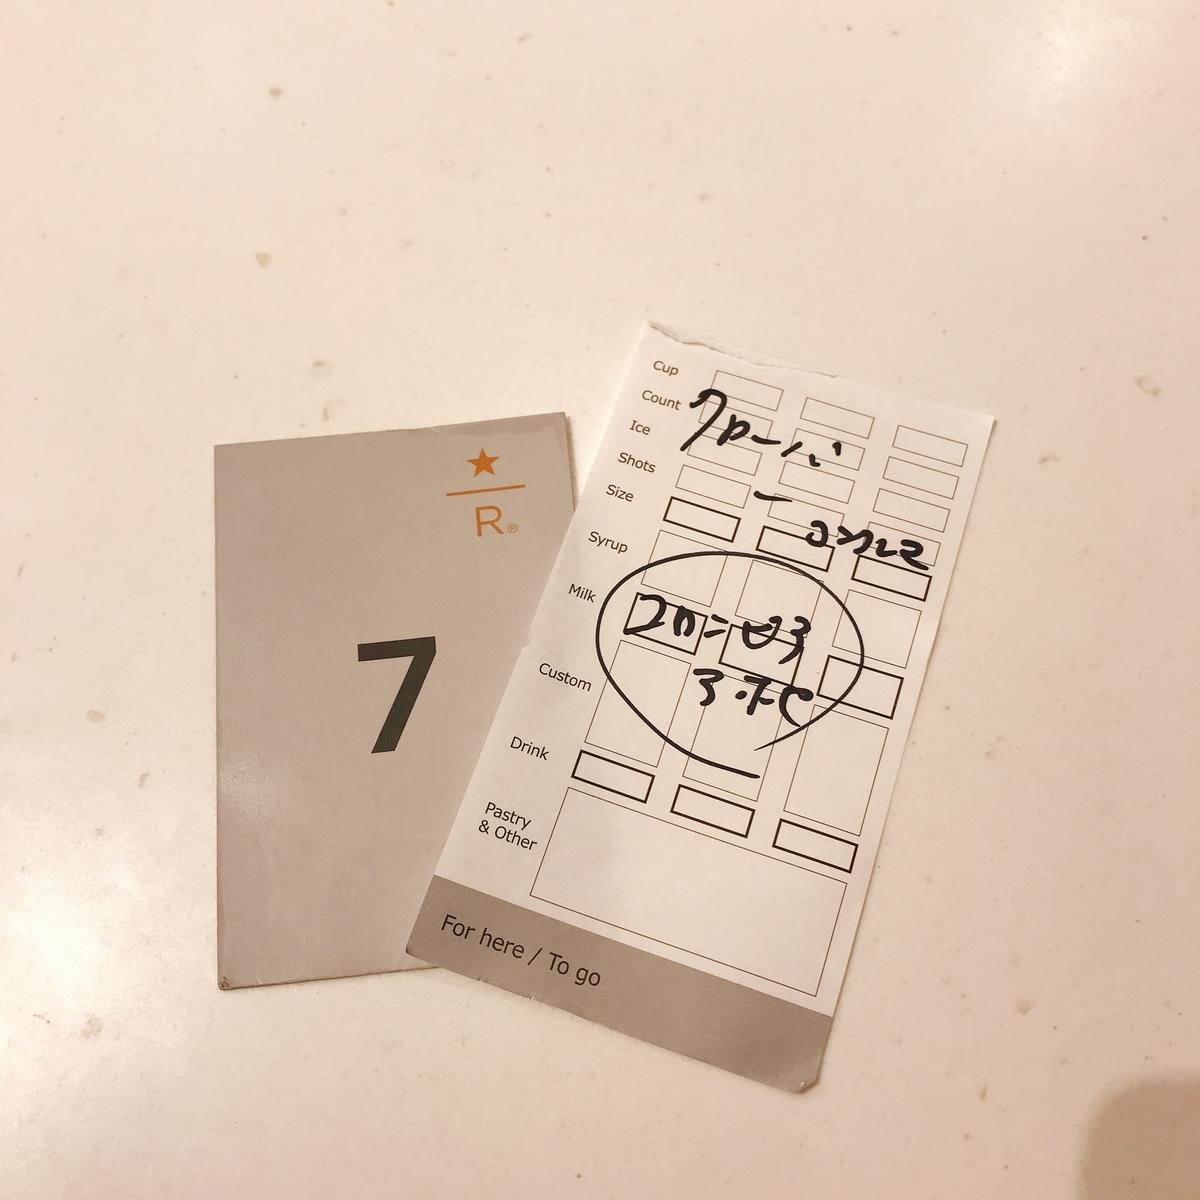 f:id:shufukatsu:20190919154545j:plain